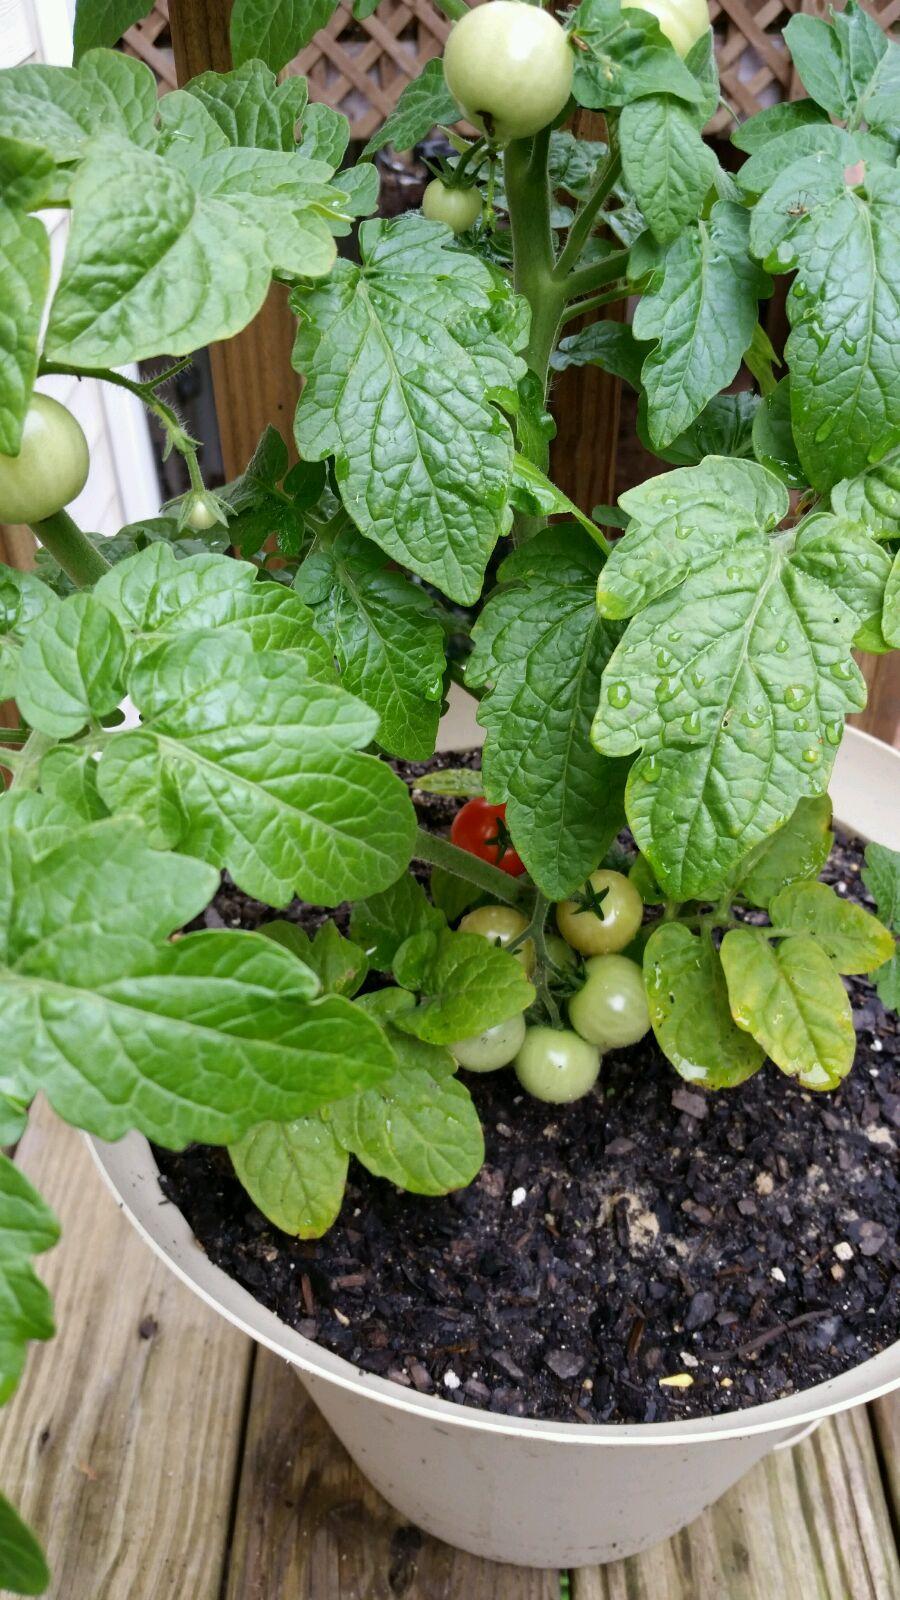 Rania's Cheery Tomatoes